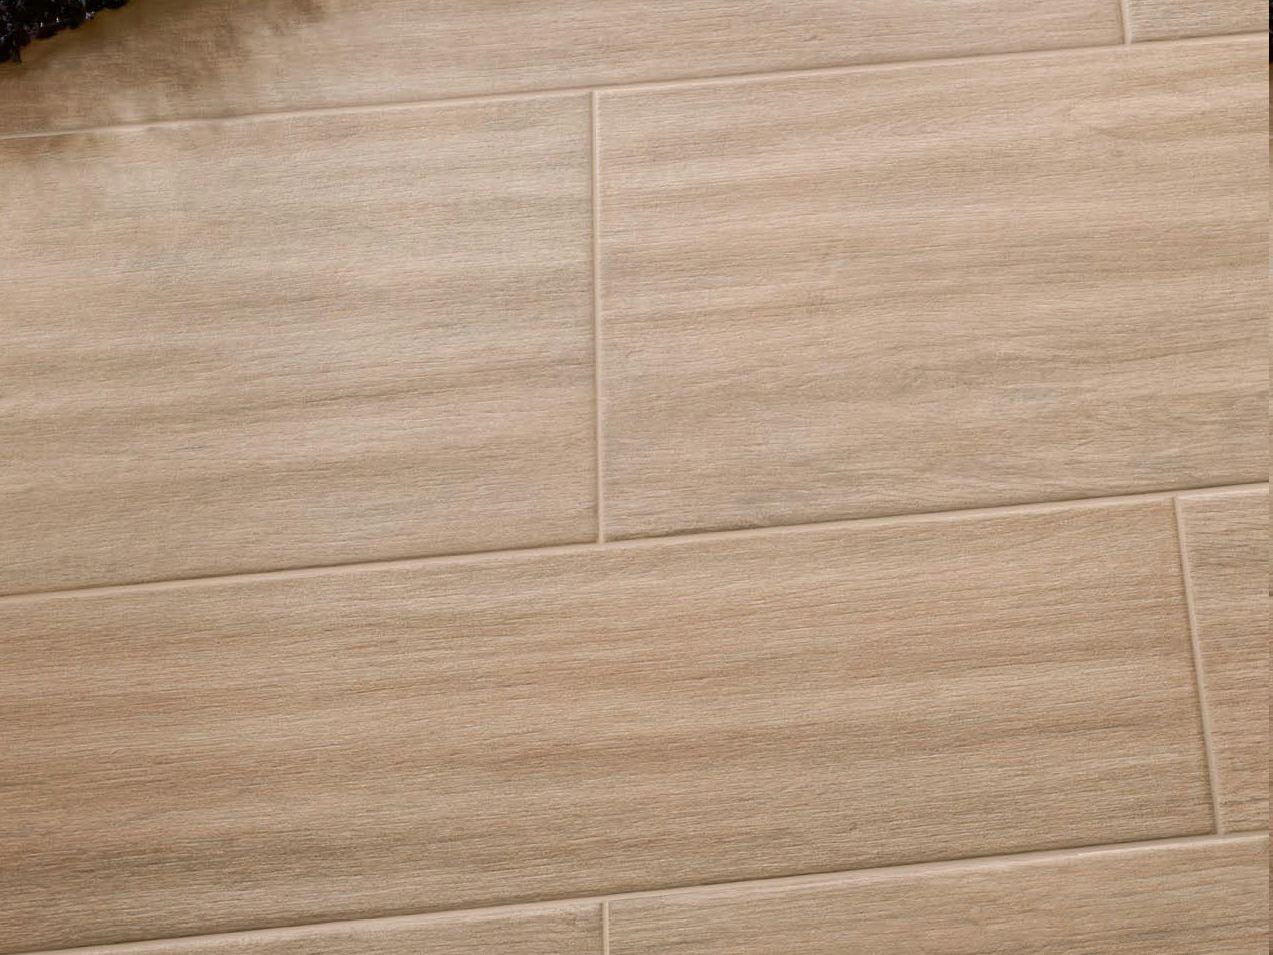 Pavimento Ceramico Imitacion Madera Elegant Piso De Porcelanato  ~ Baldosas Imitacion Madera Precios